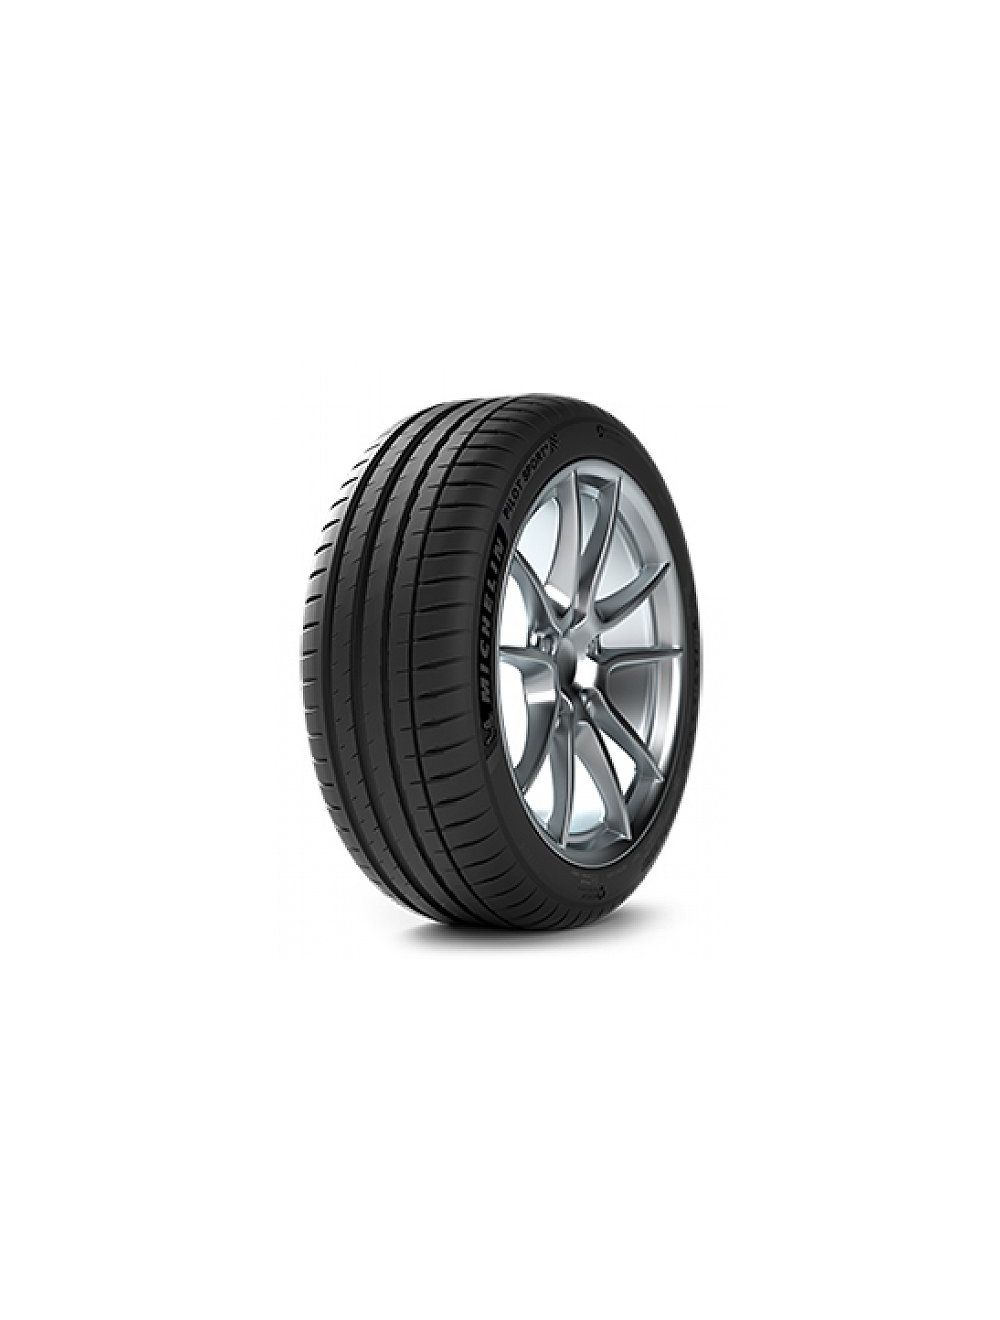 Michelin 255/45R19 Y Pilot Sport 4 XL AO S1 Ac Nyári gumi